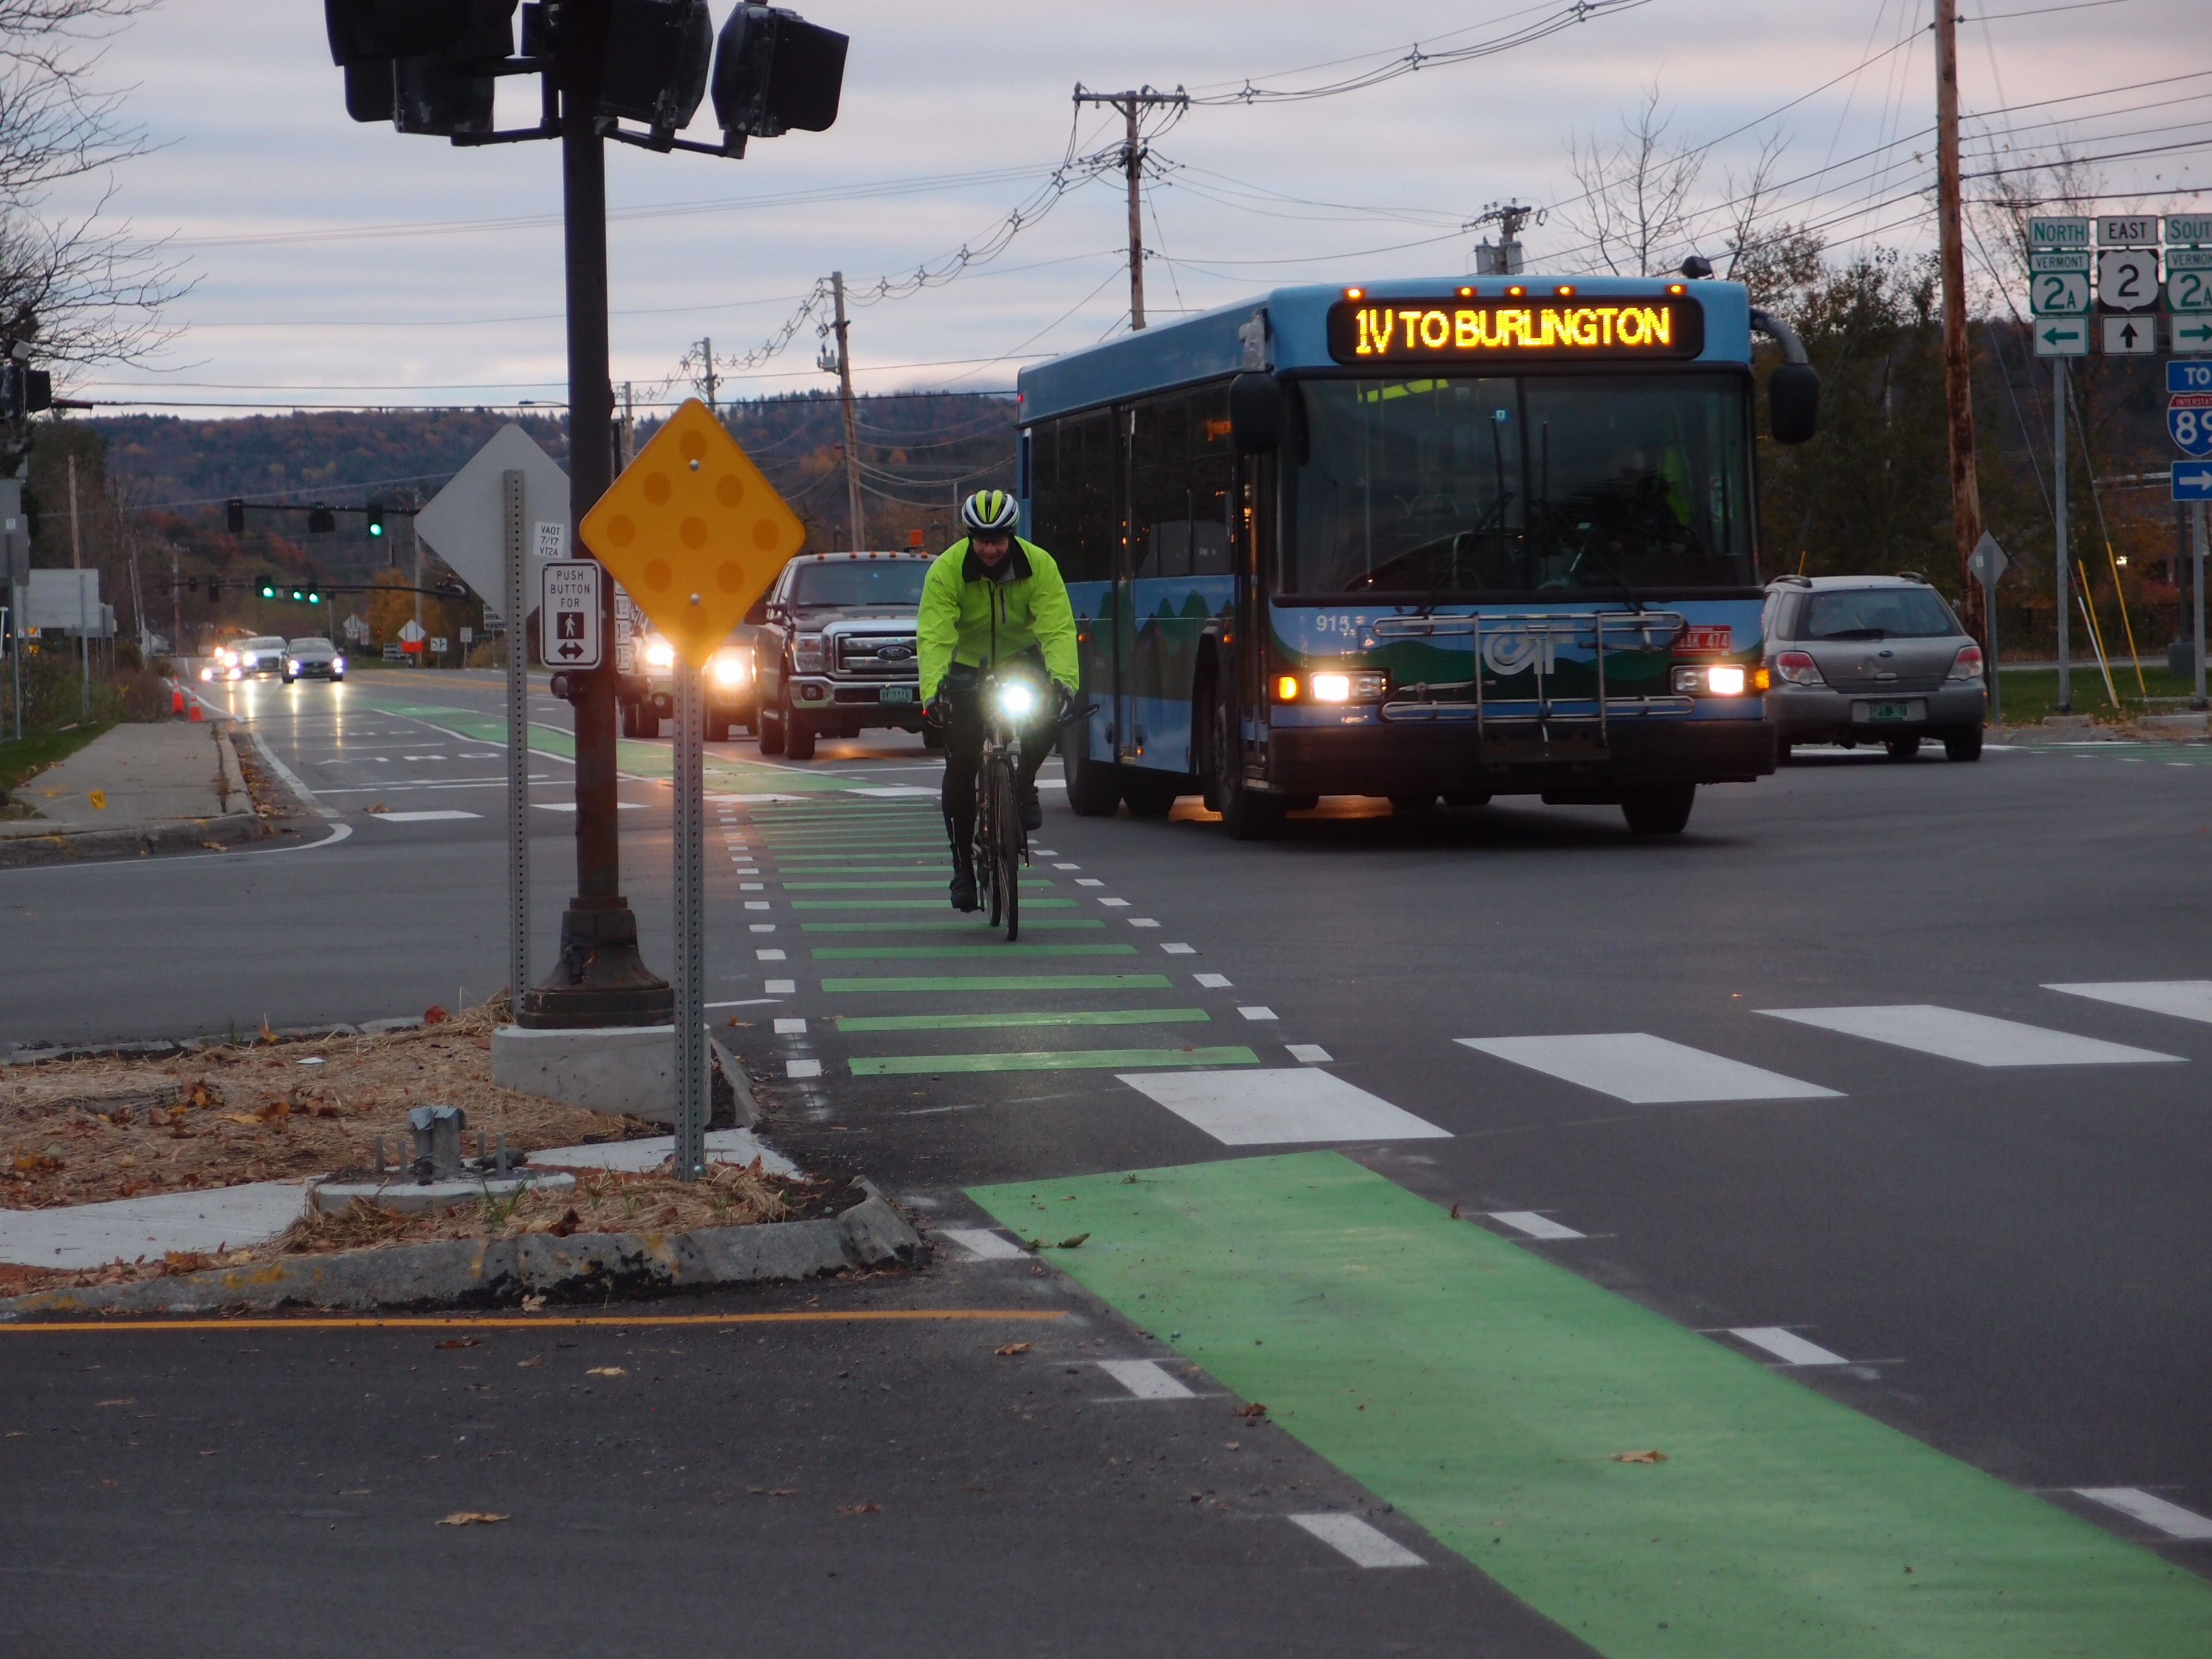 Bike commuter rides in bike lane during after work traffic